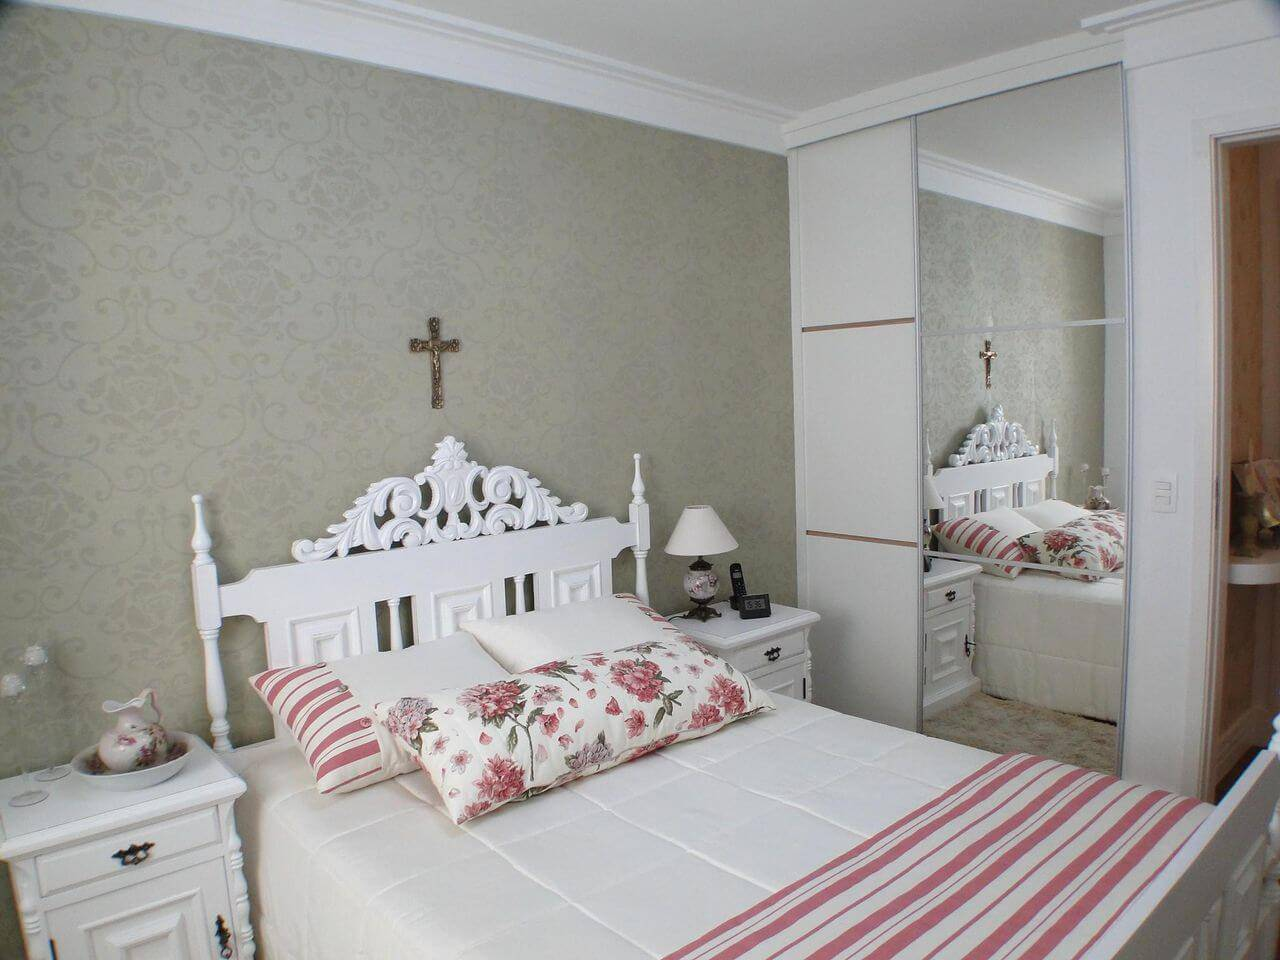 cama de casal com estrutura madeira giuliano luchetti 29769